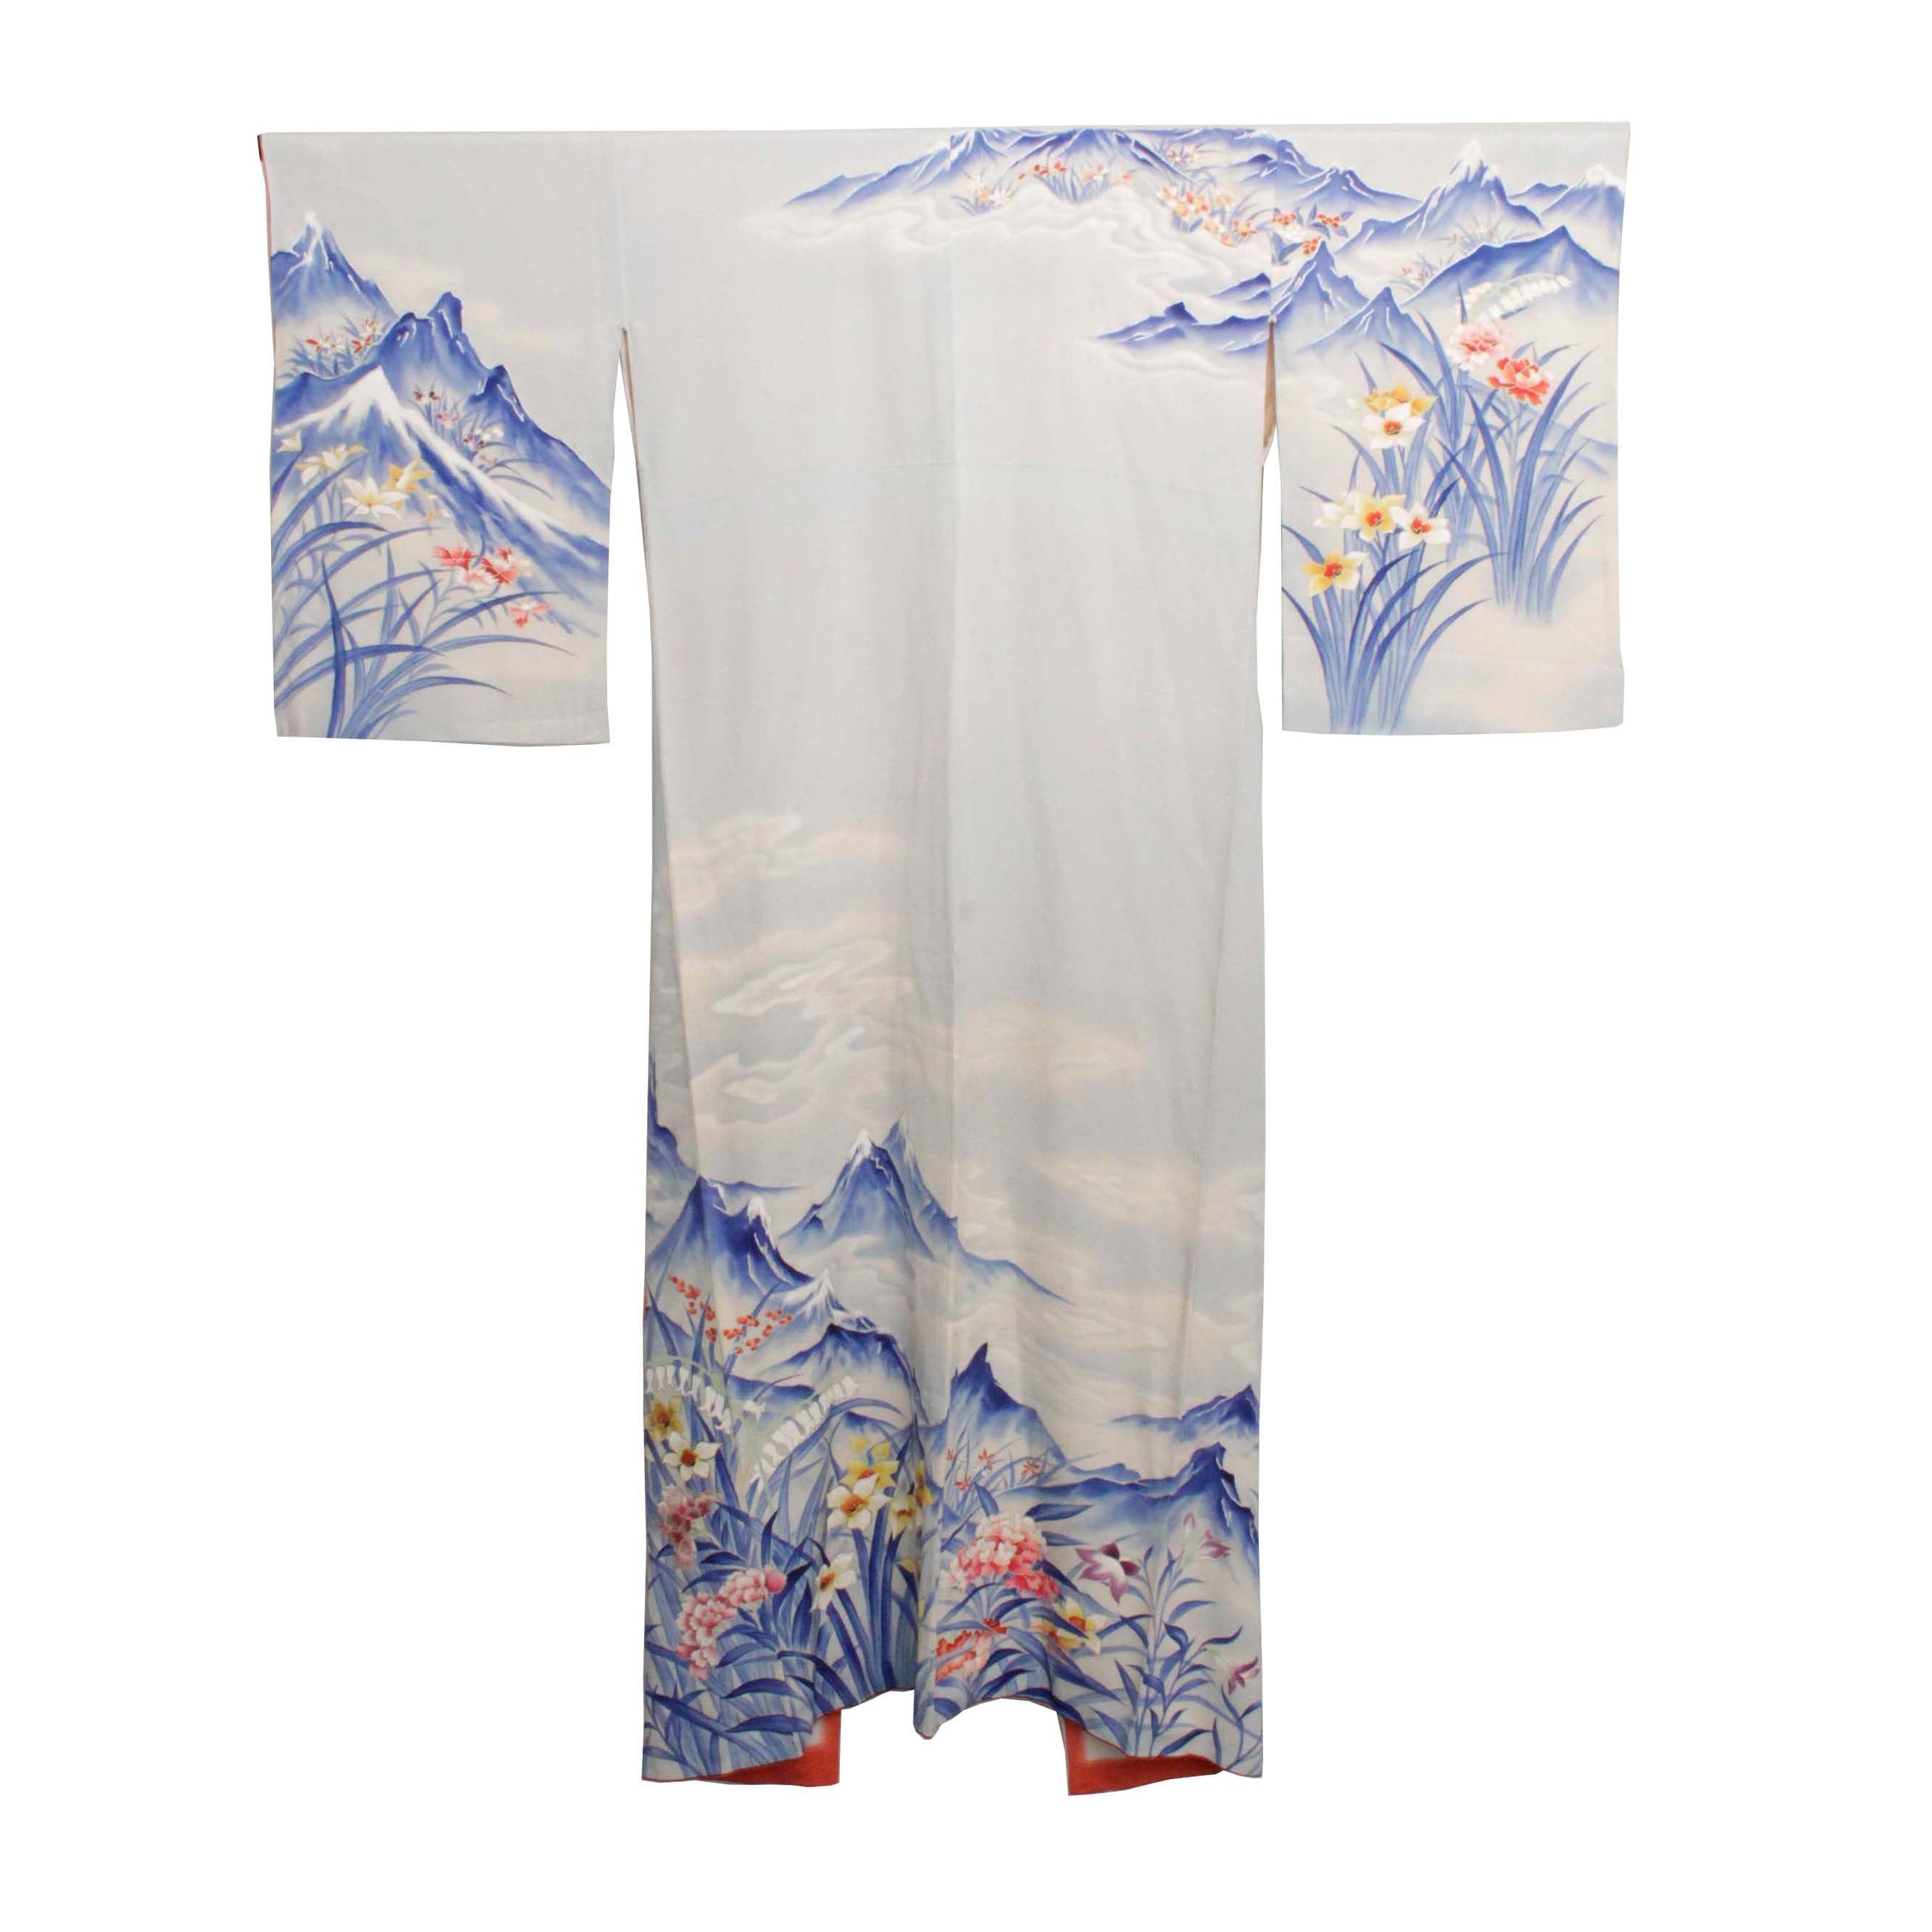 Circa 1930 Vintage Handwoven Silk Crepe Kimono